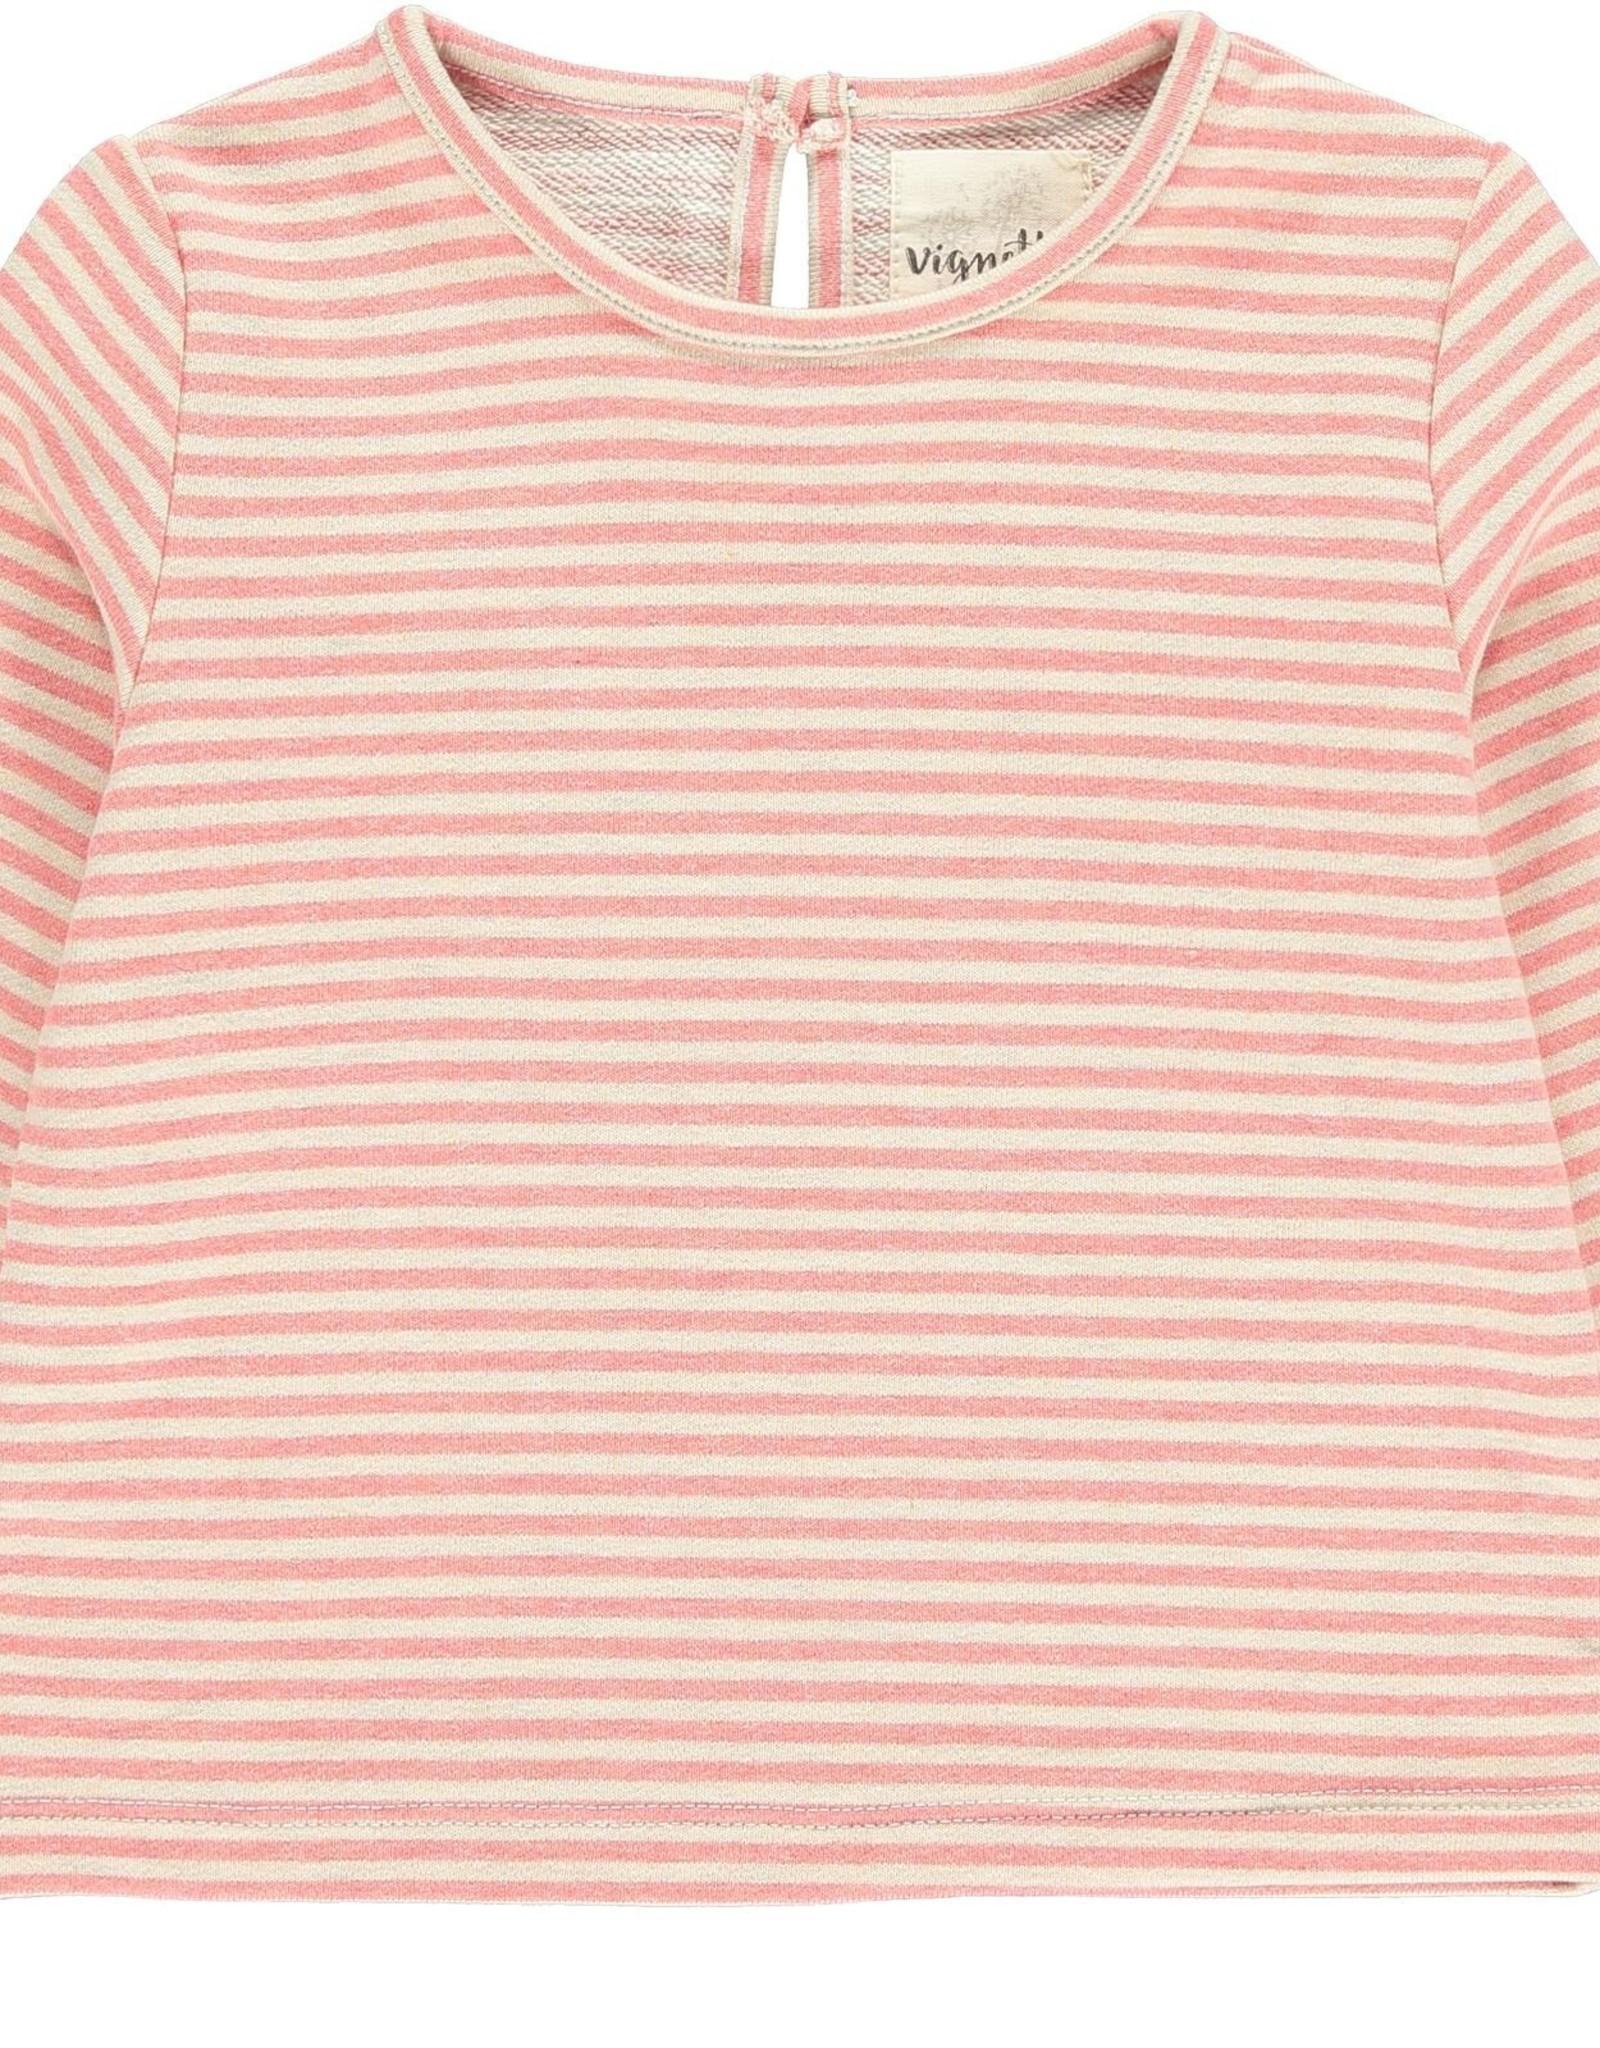 Vignette Bailey Sweater, Rose